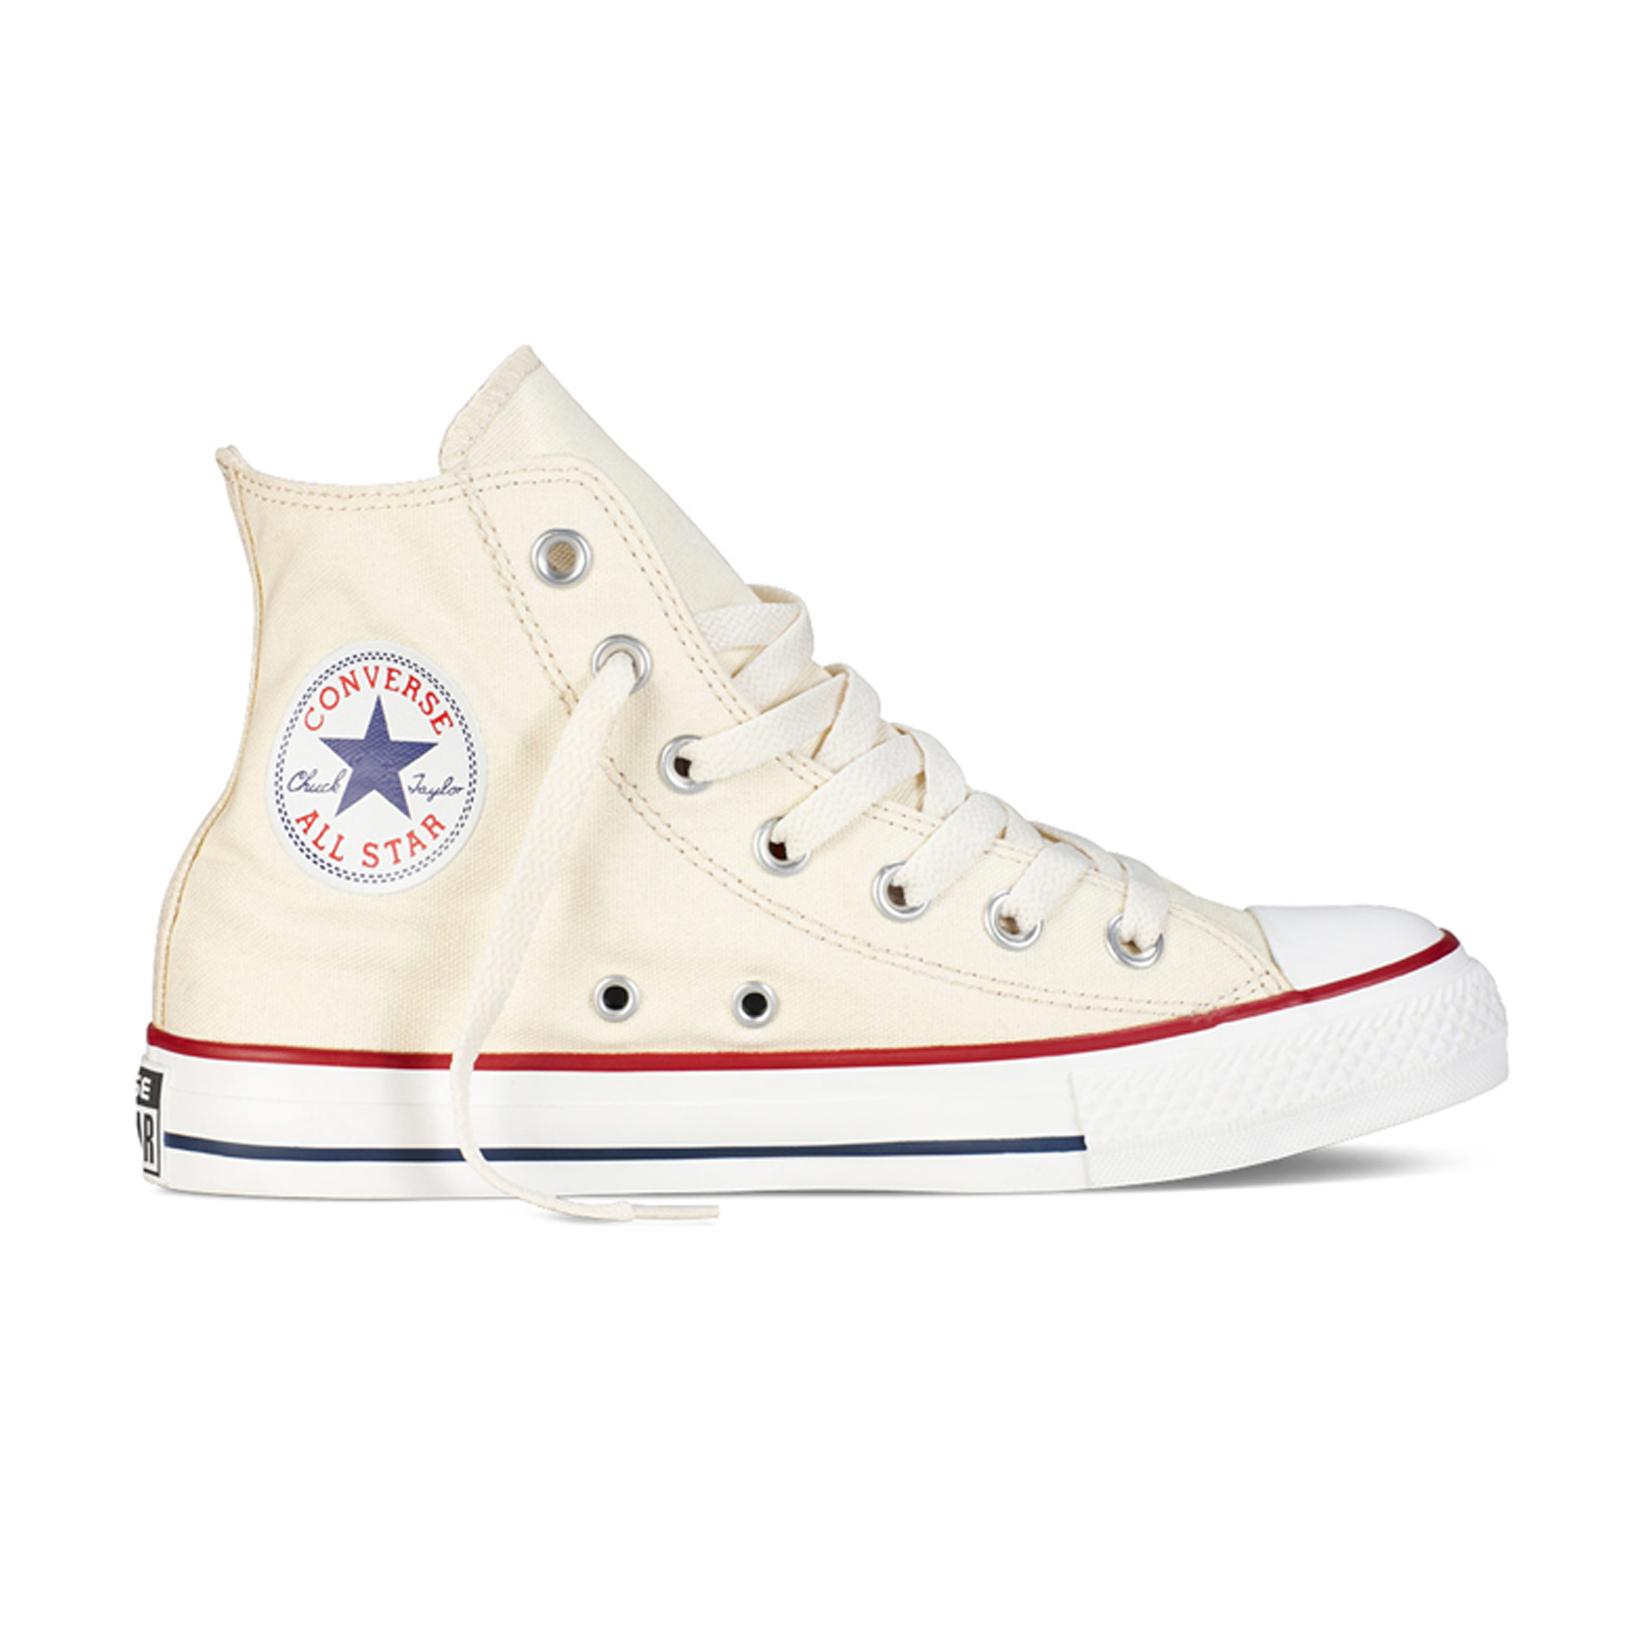 Converse Chuck Taylor All Star Hi Natural White